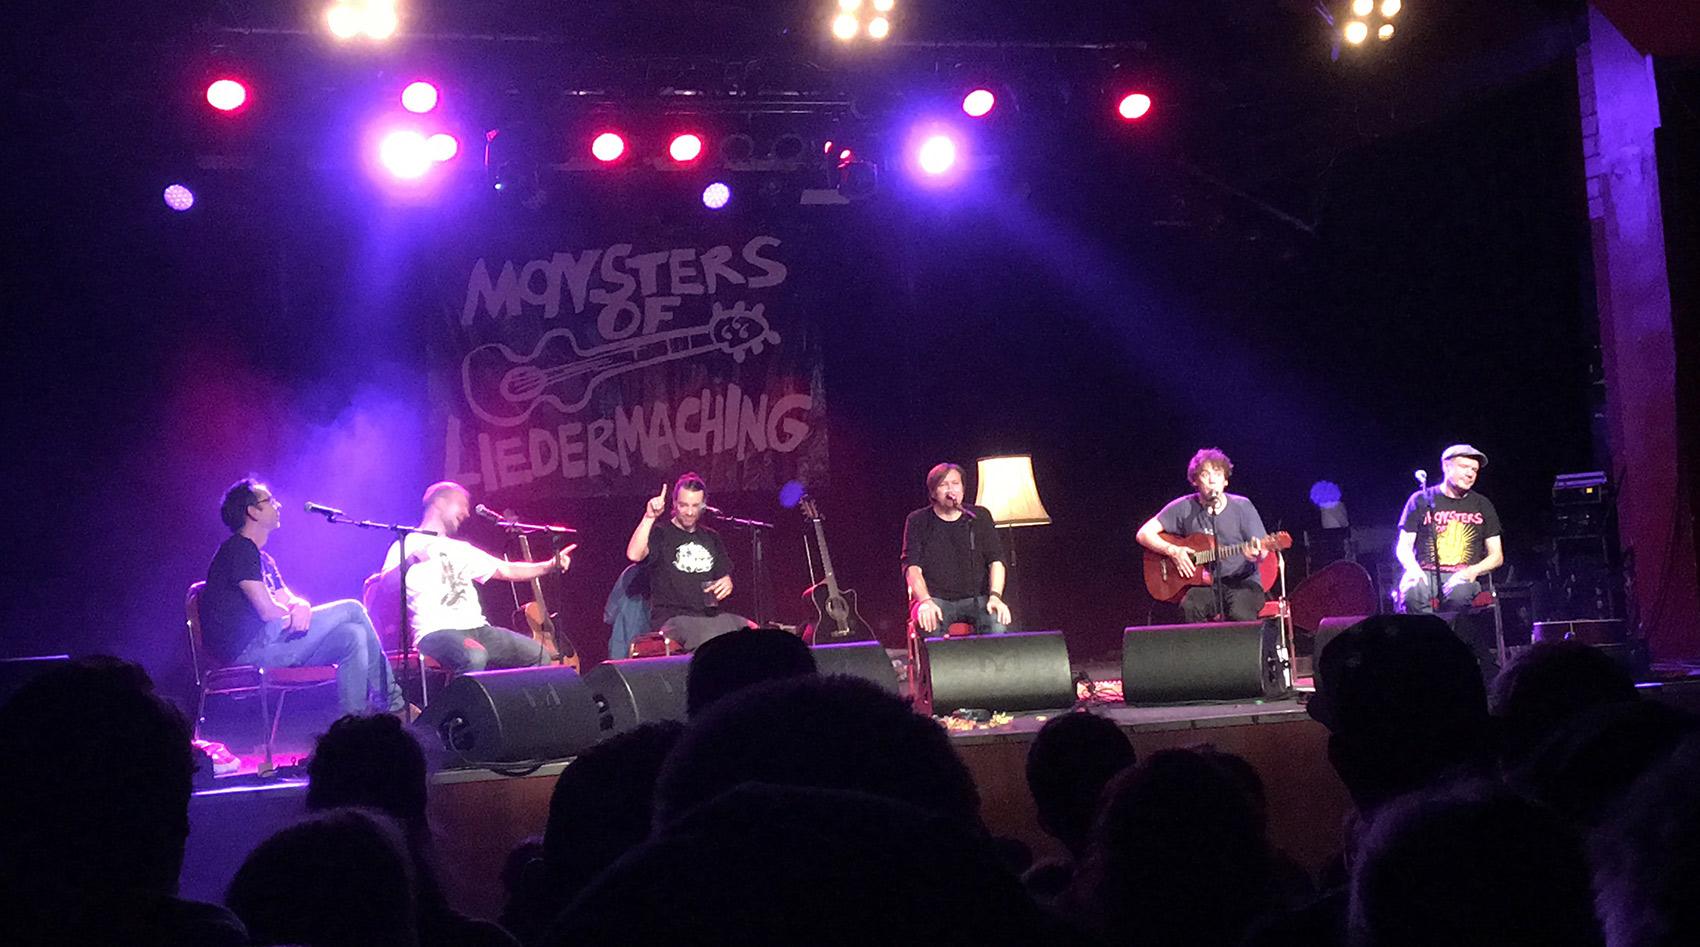 Monsters of Liedermaching - Berlin, Astra, 20.11.2016